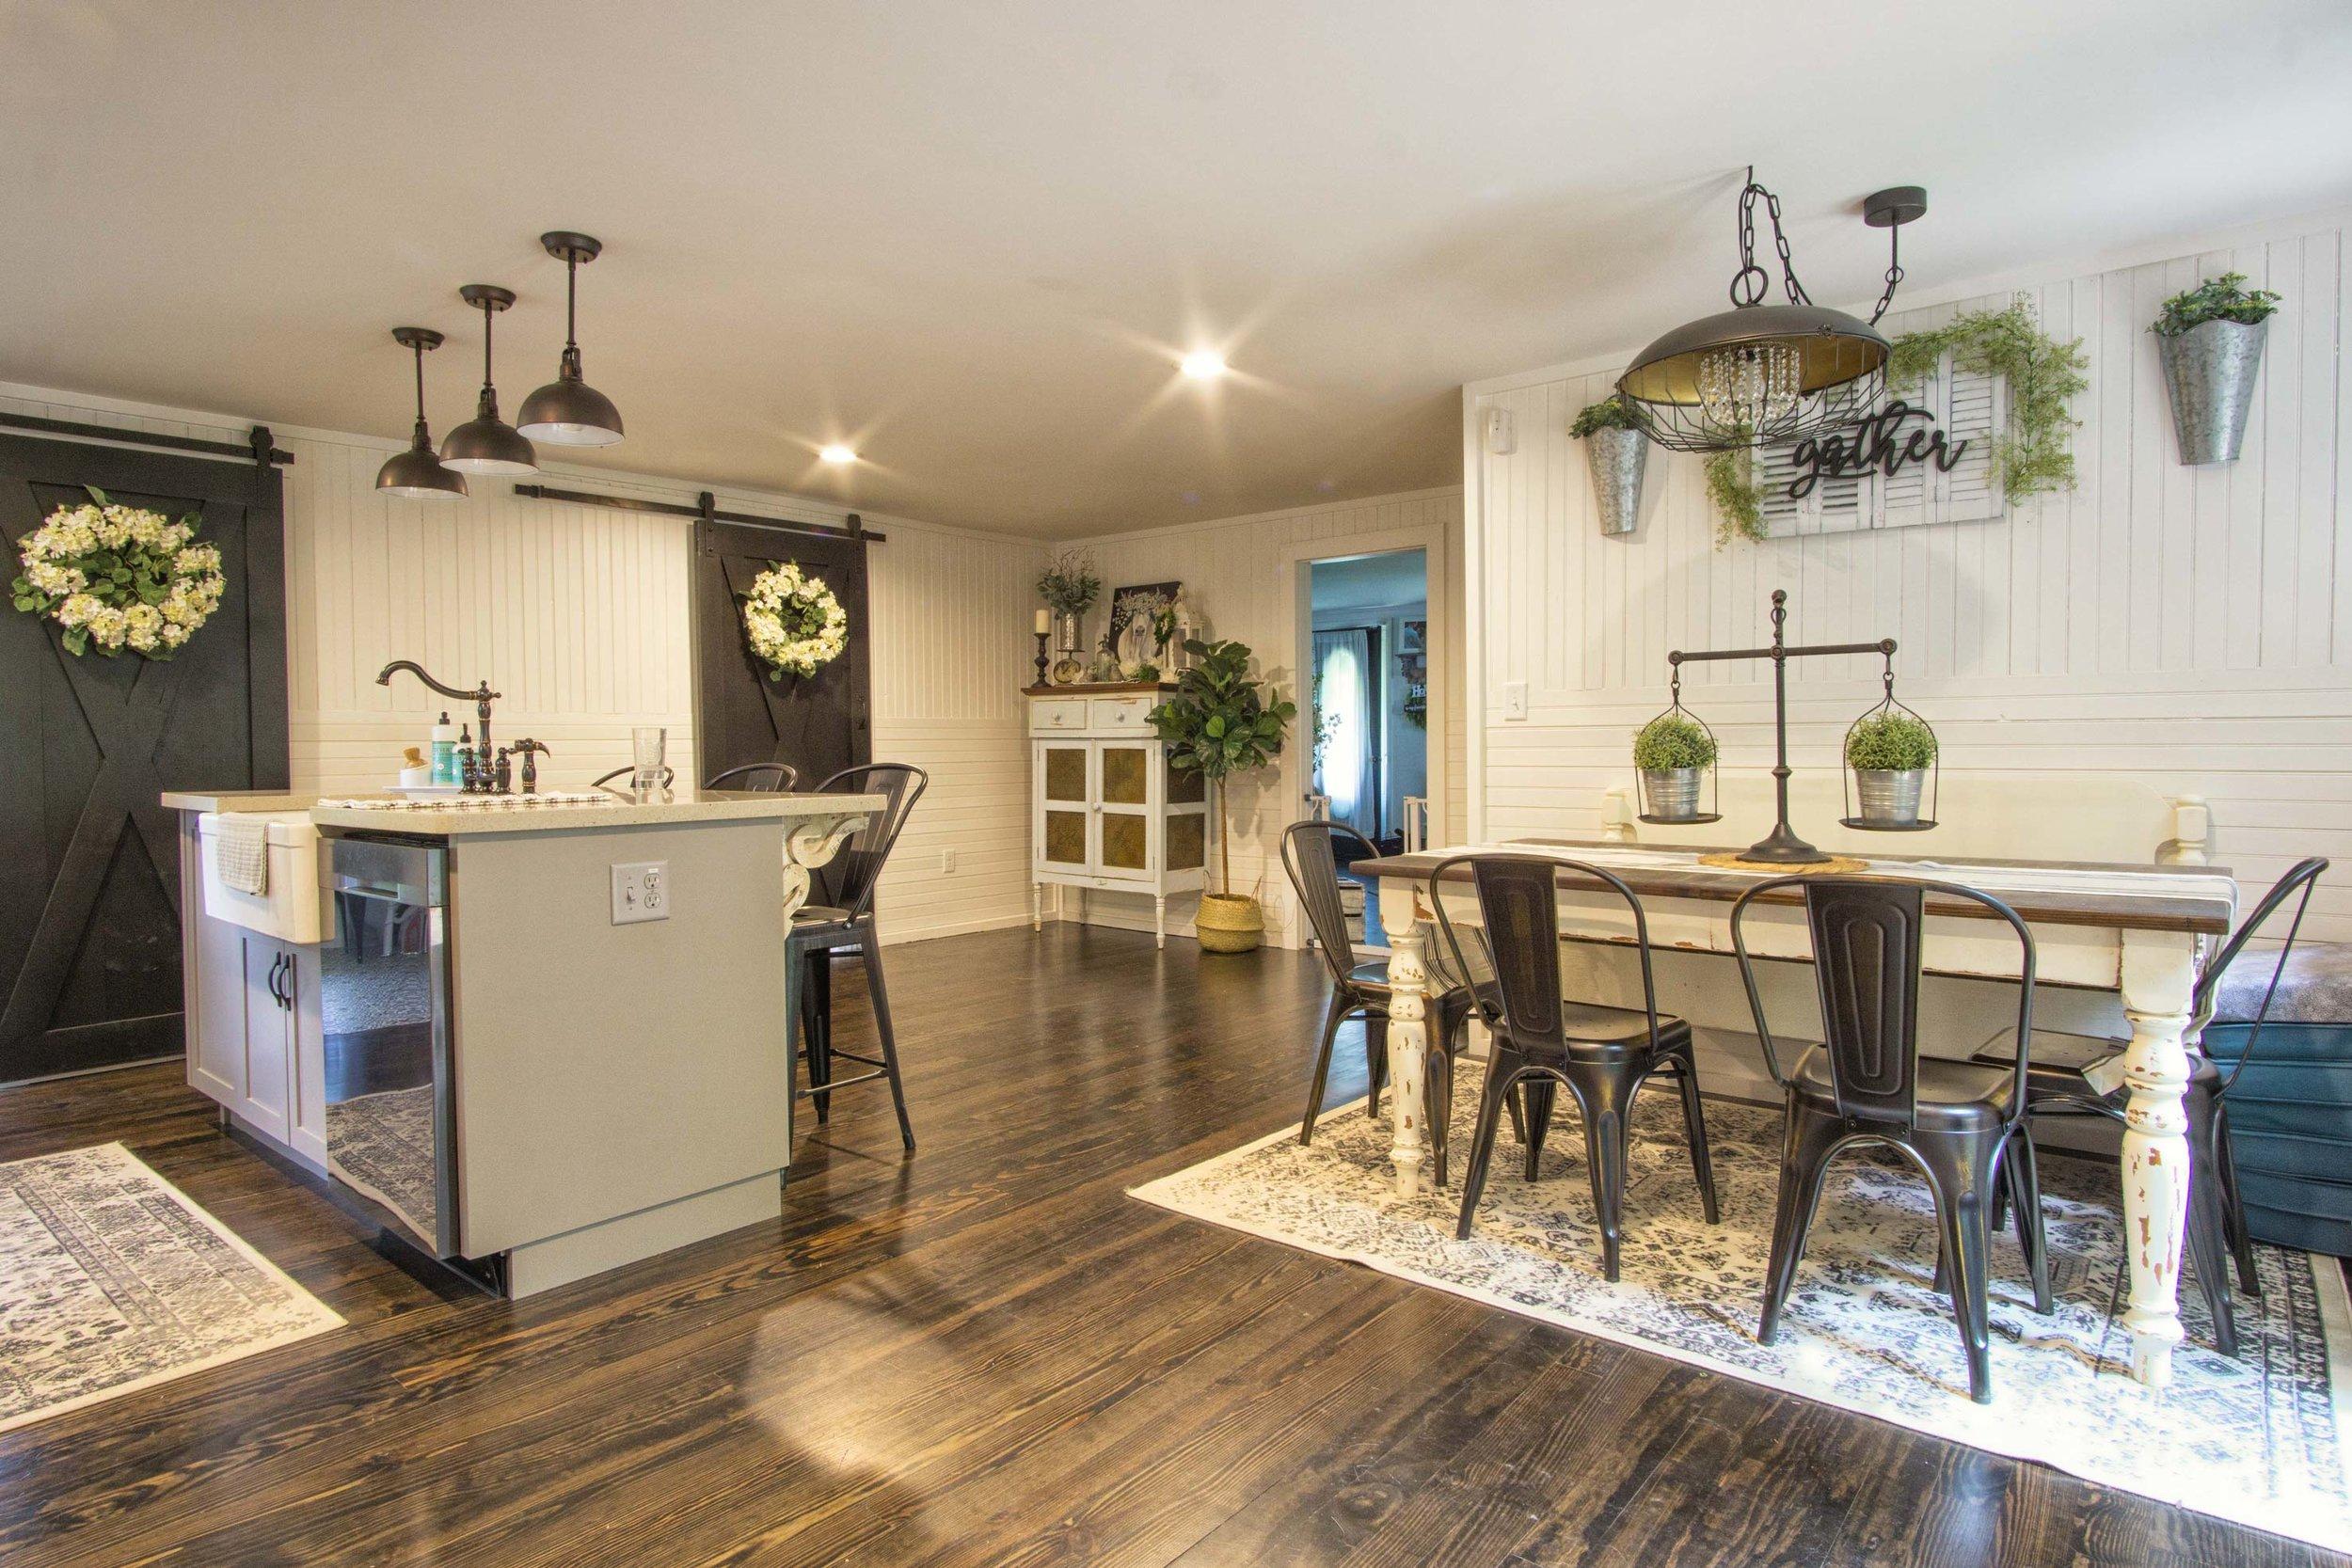 barn-kitchen-remodel